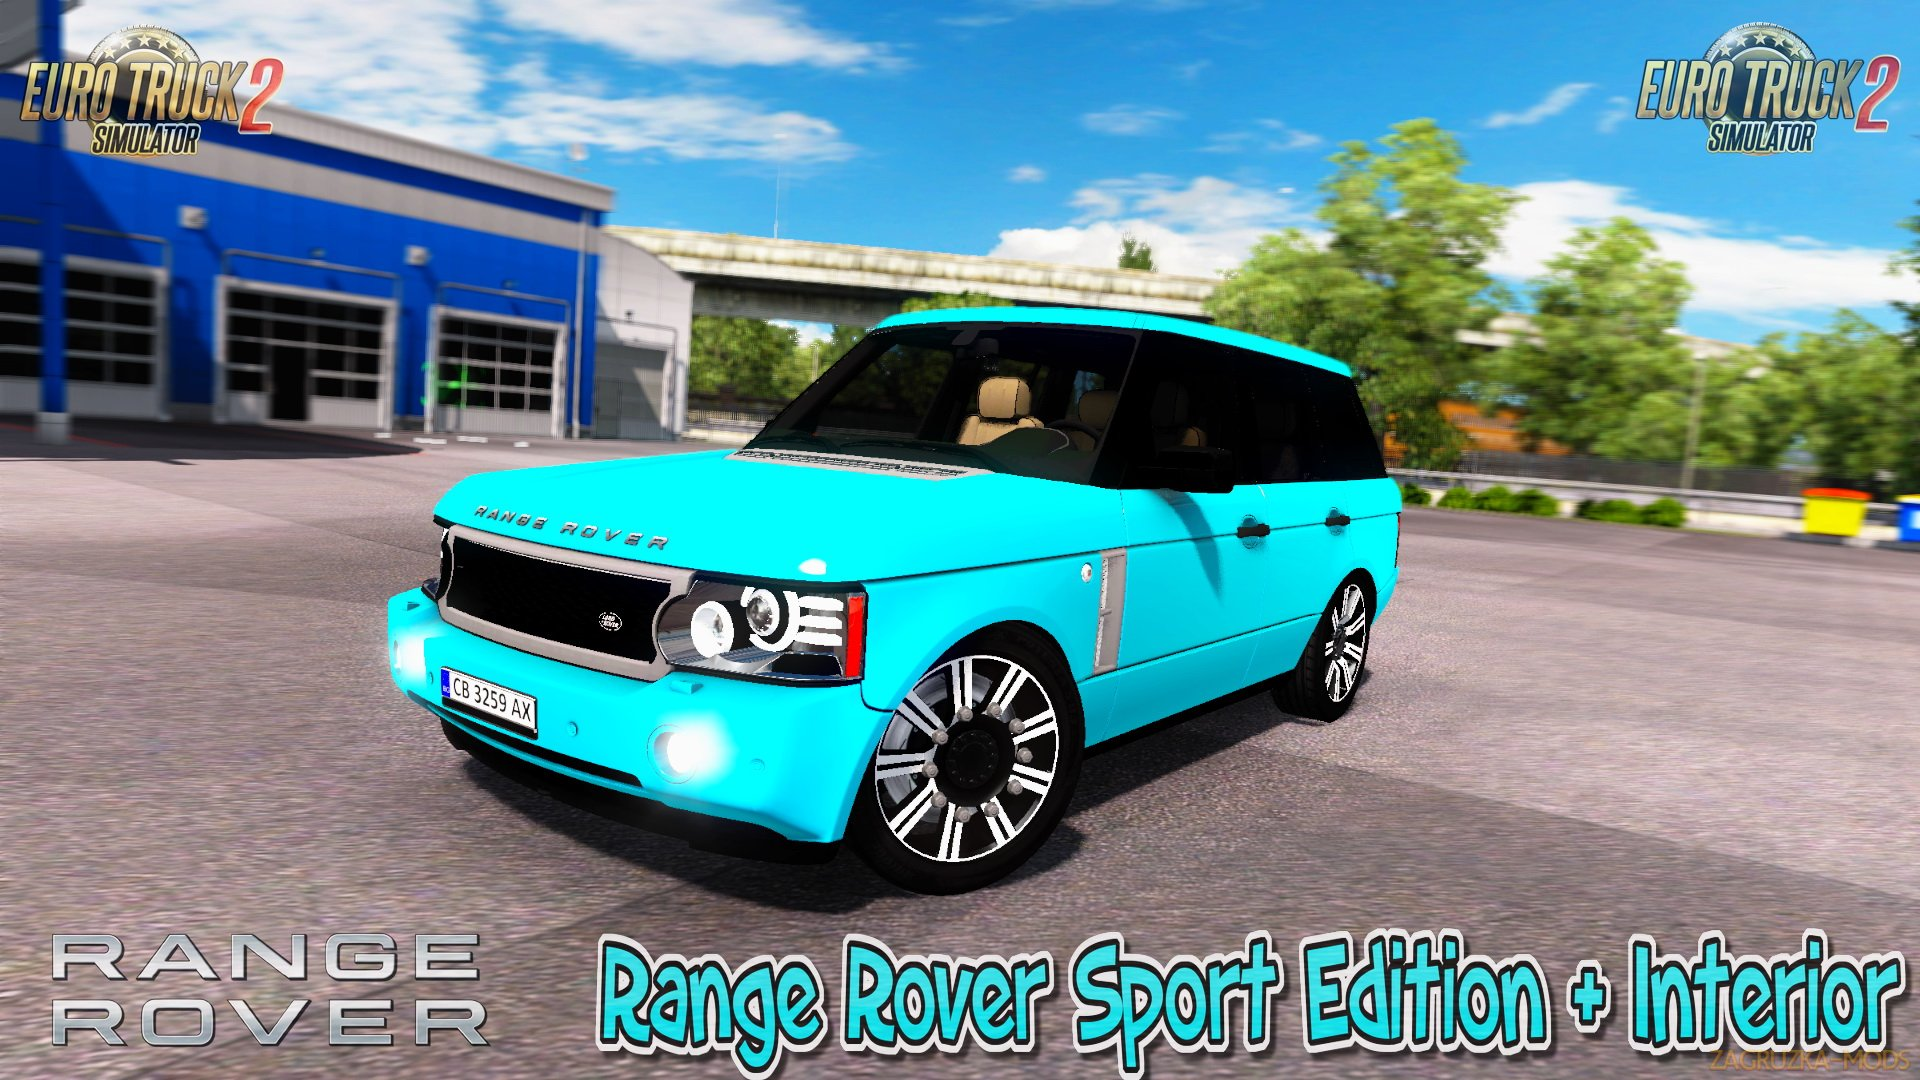 Range Rover Sport Edition + Interior v1 0 (1 26 x) for ETS 2